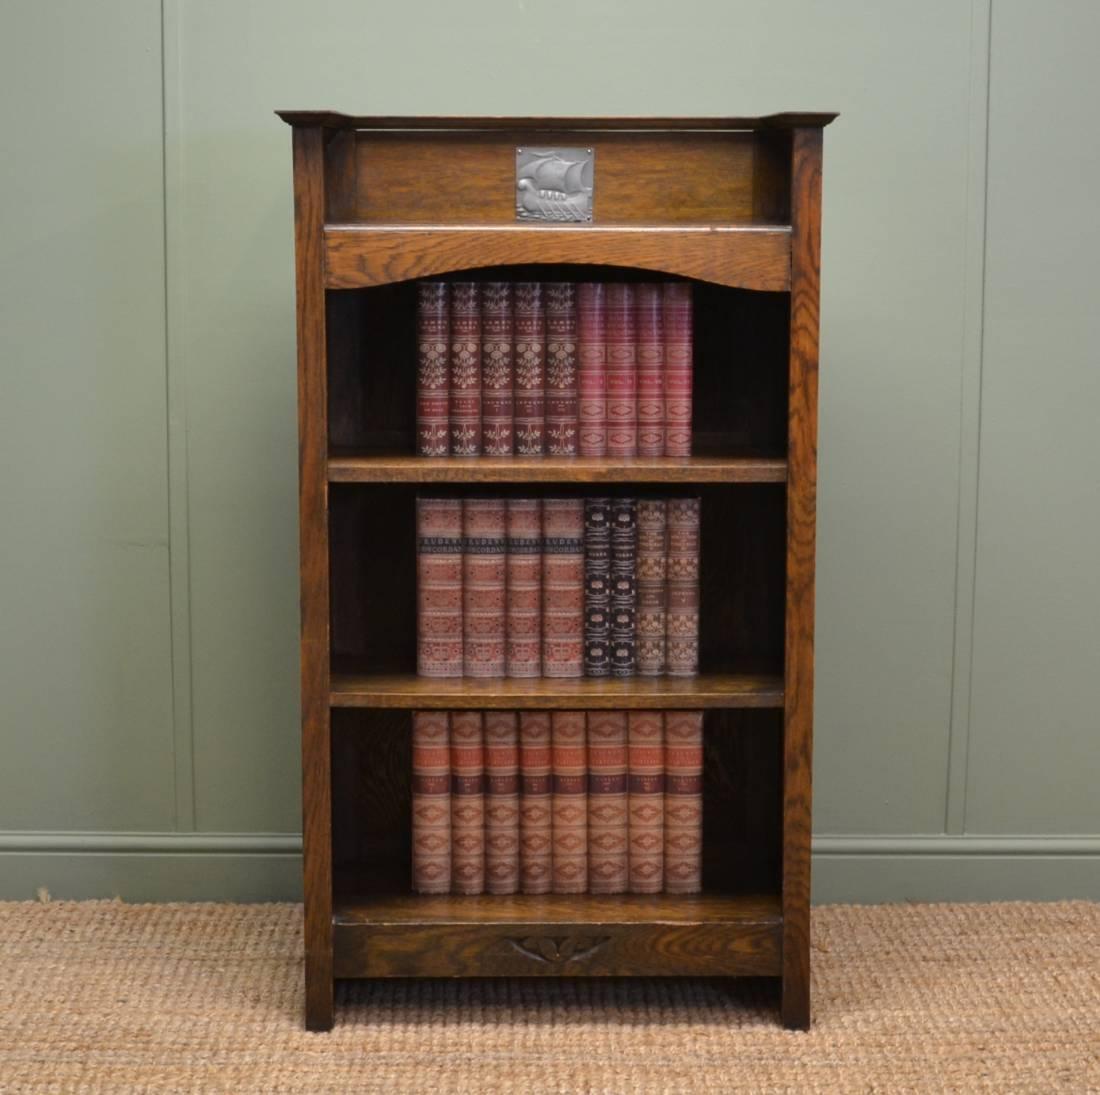 Small Arts & Crafts Antique Oak Open Bookcase - Antiques World